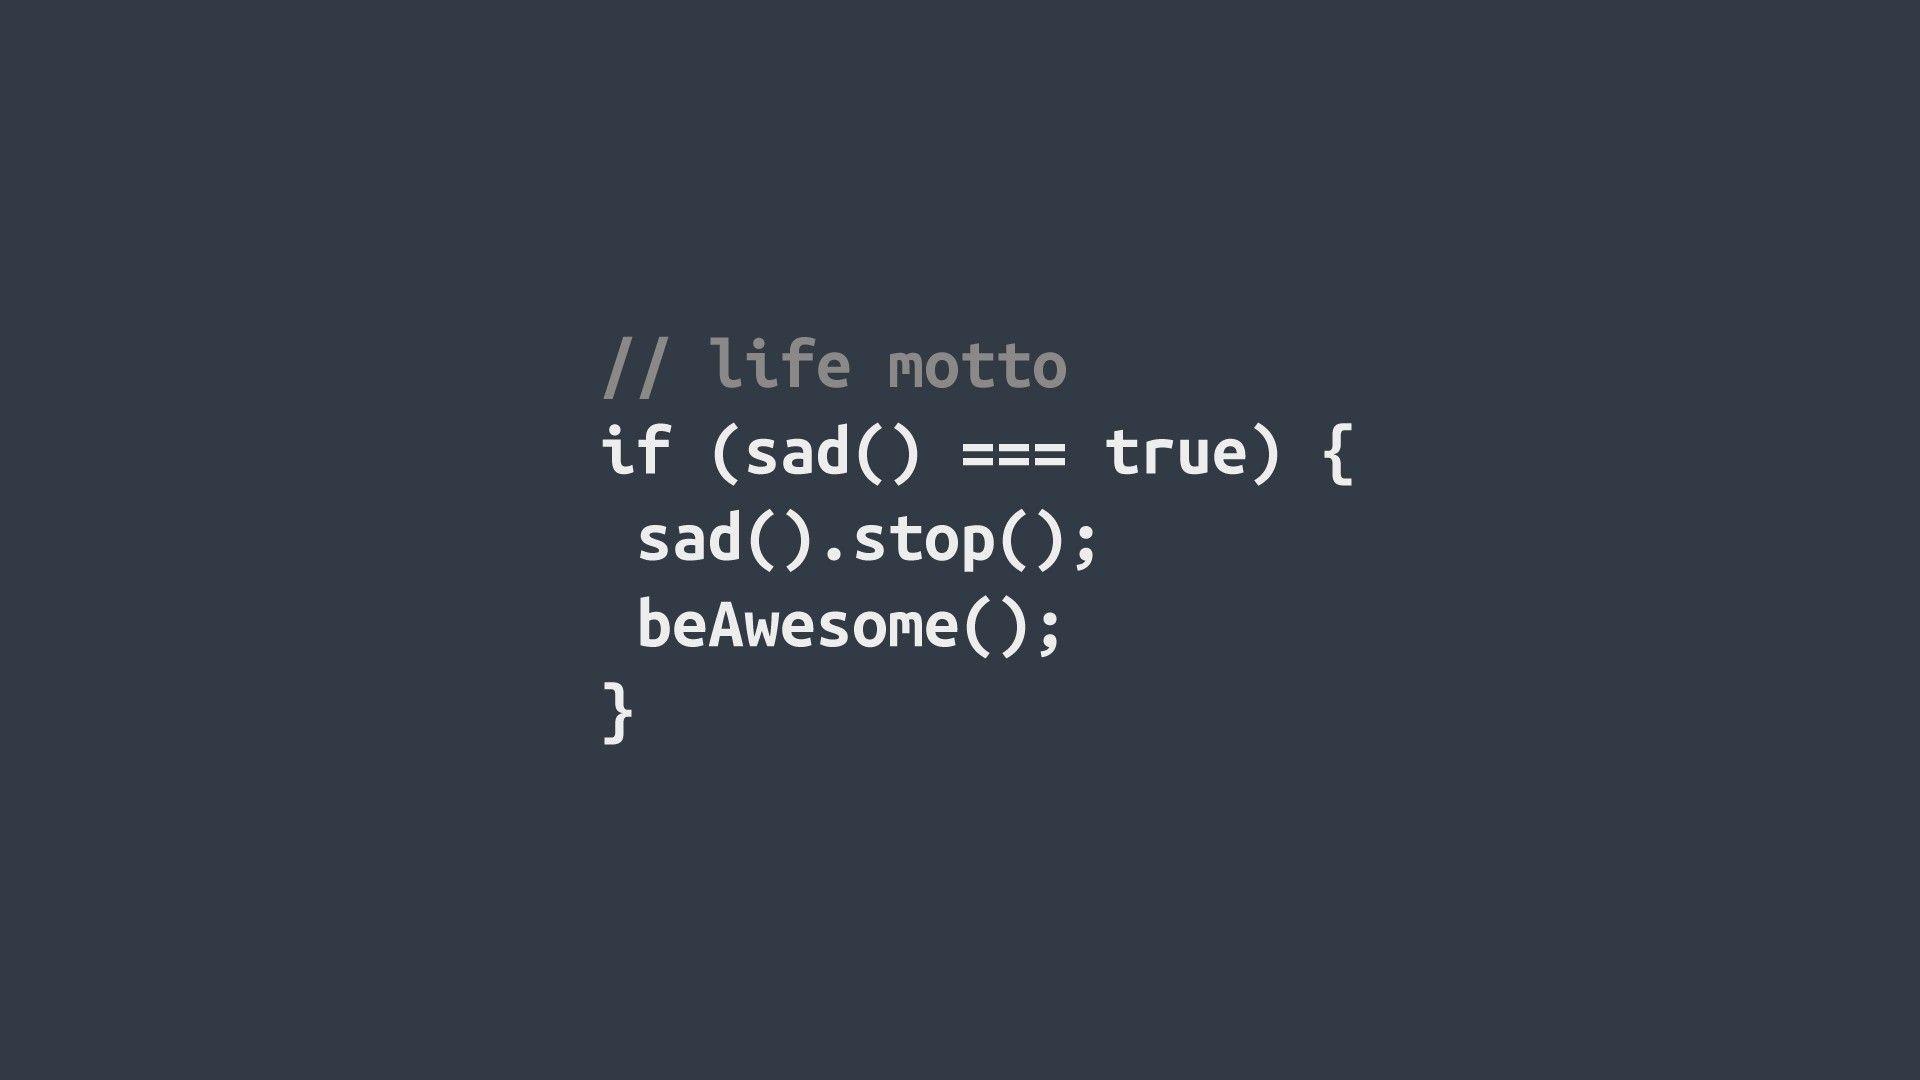 nerdy-life-motto.jpg